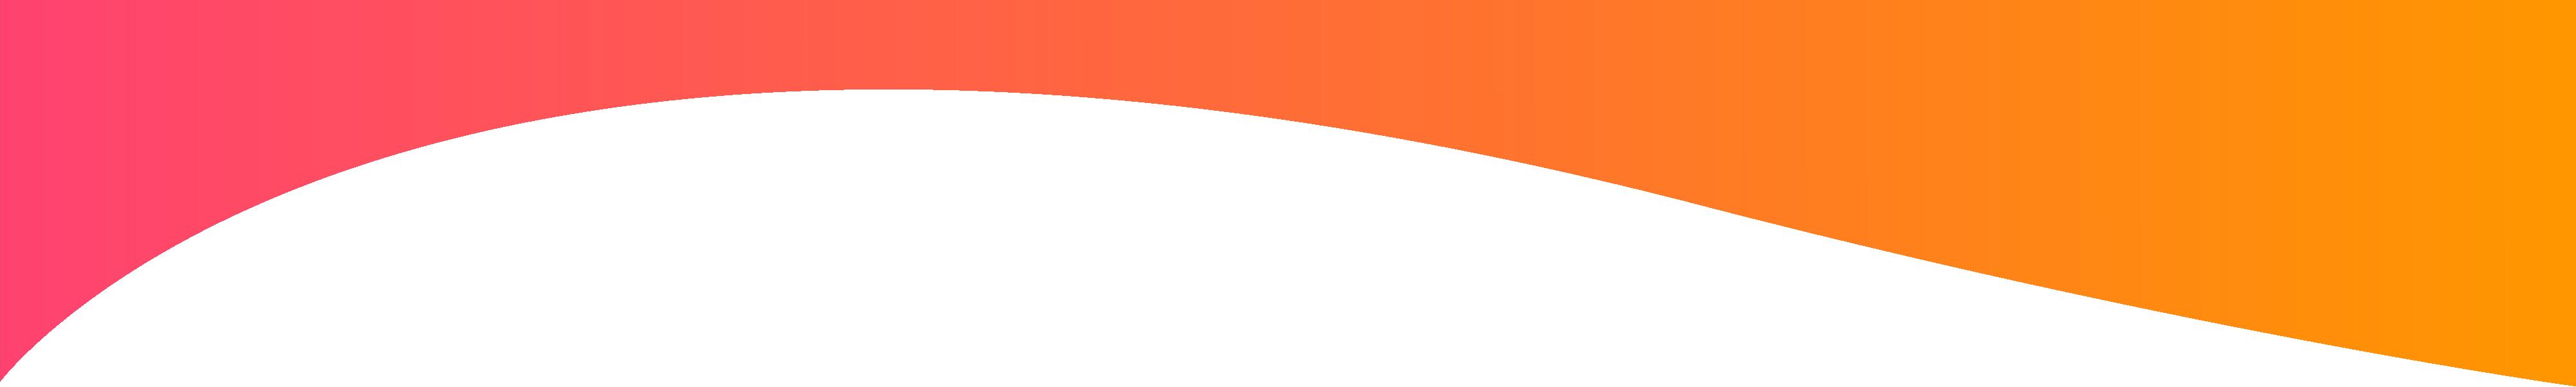 onda-parziale-inferiore-600-px-gradiente-.png